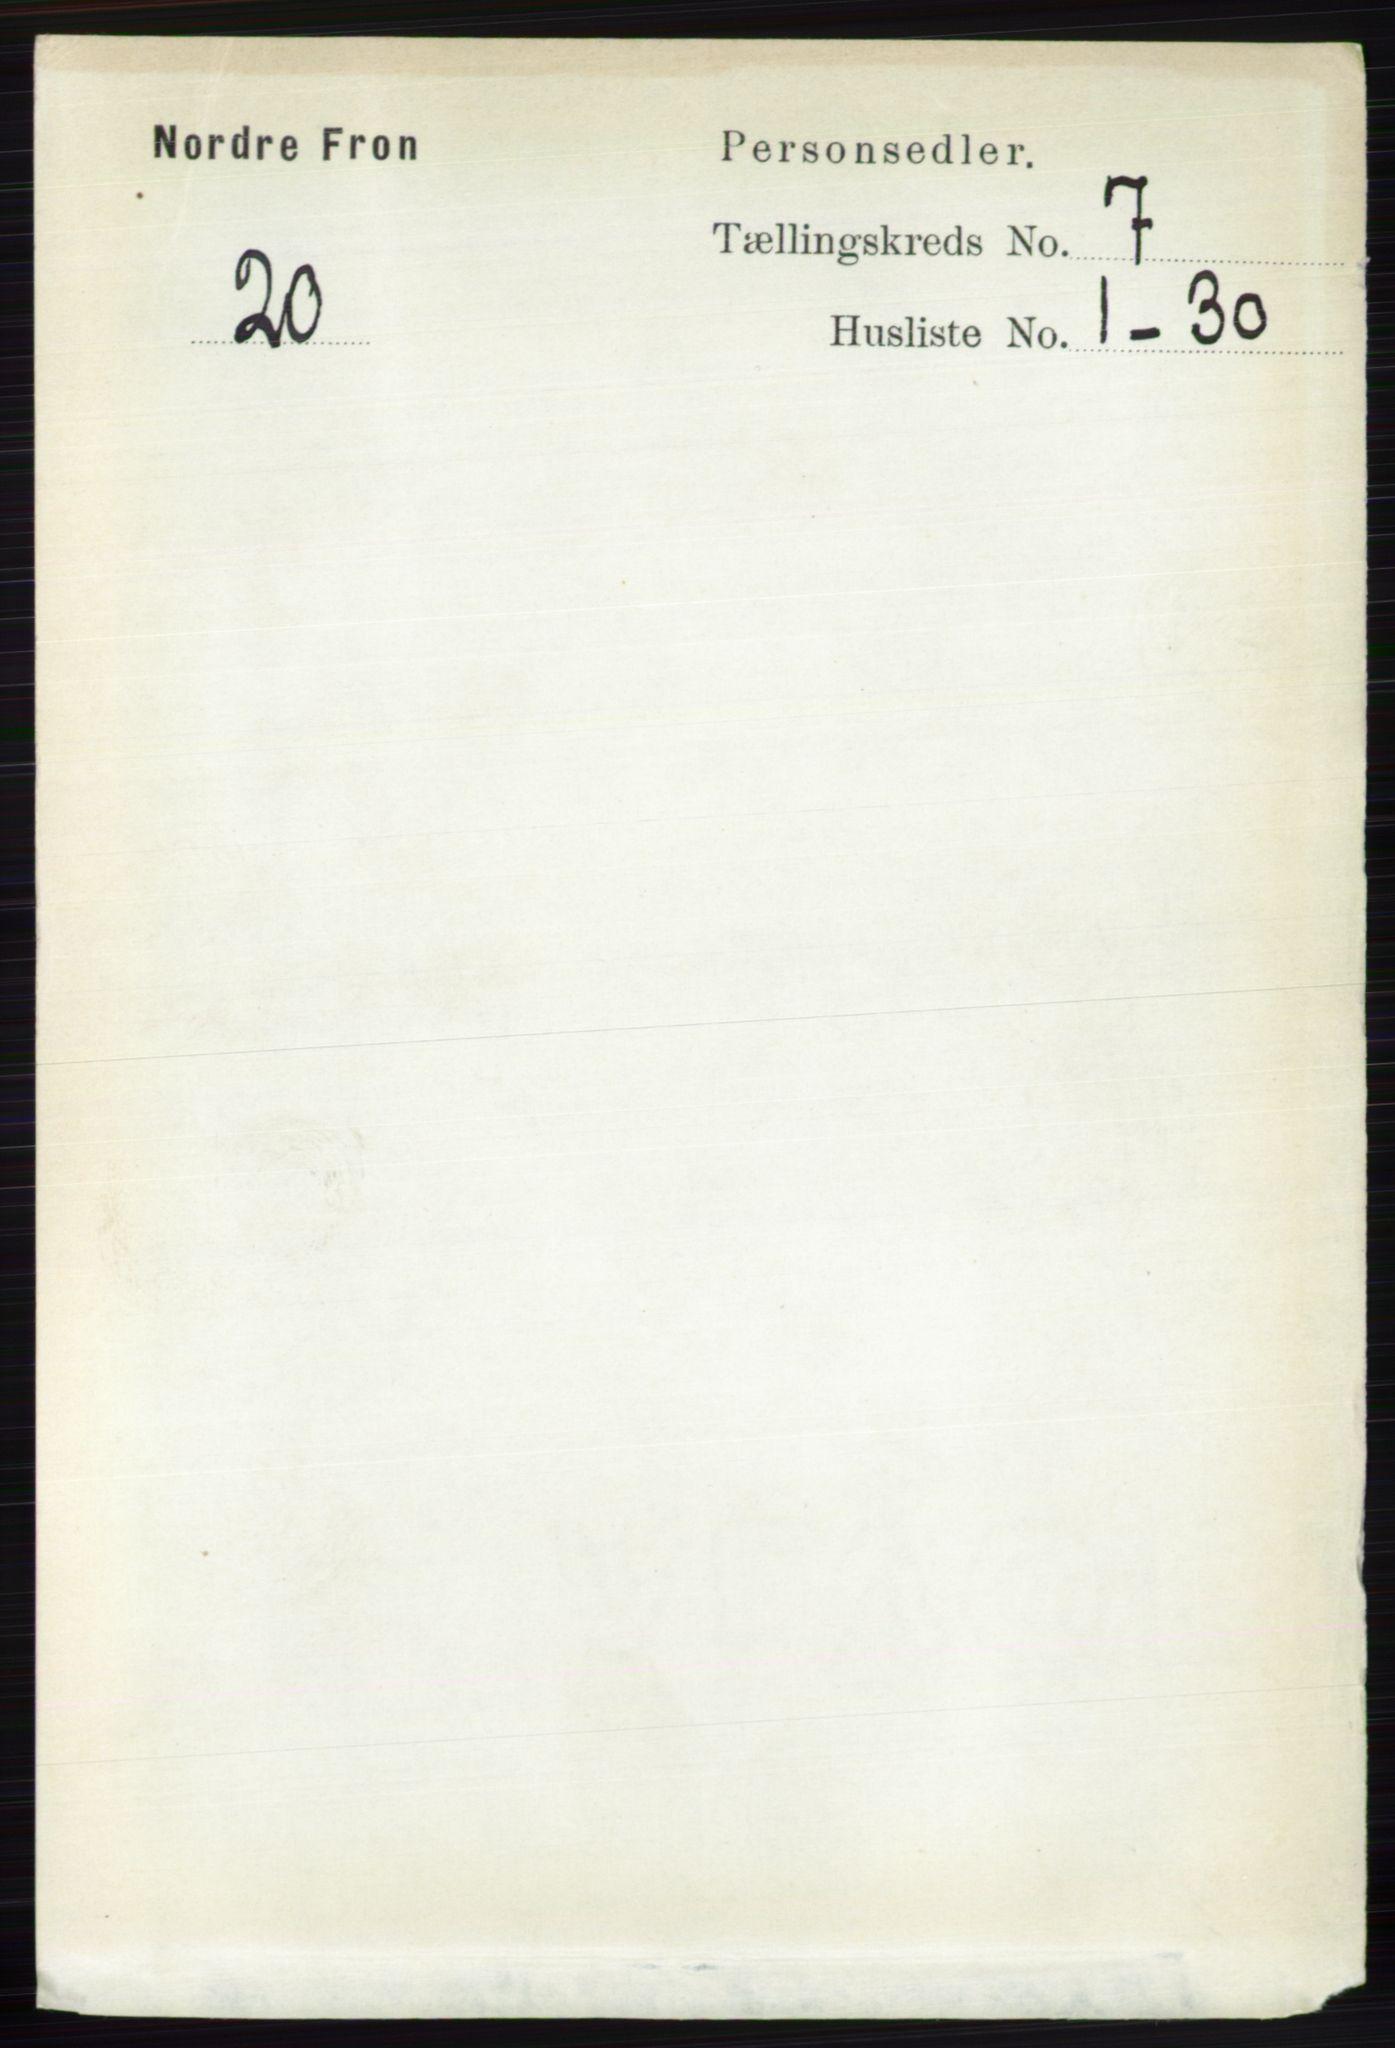 RA, Folketelling 1891 for 0518 Nord-Fron herred, 1891, s. 2836